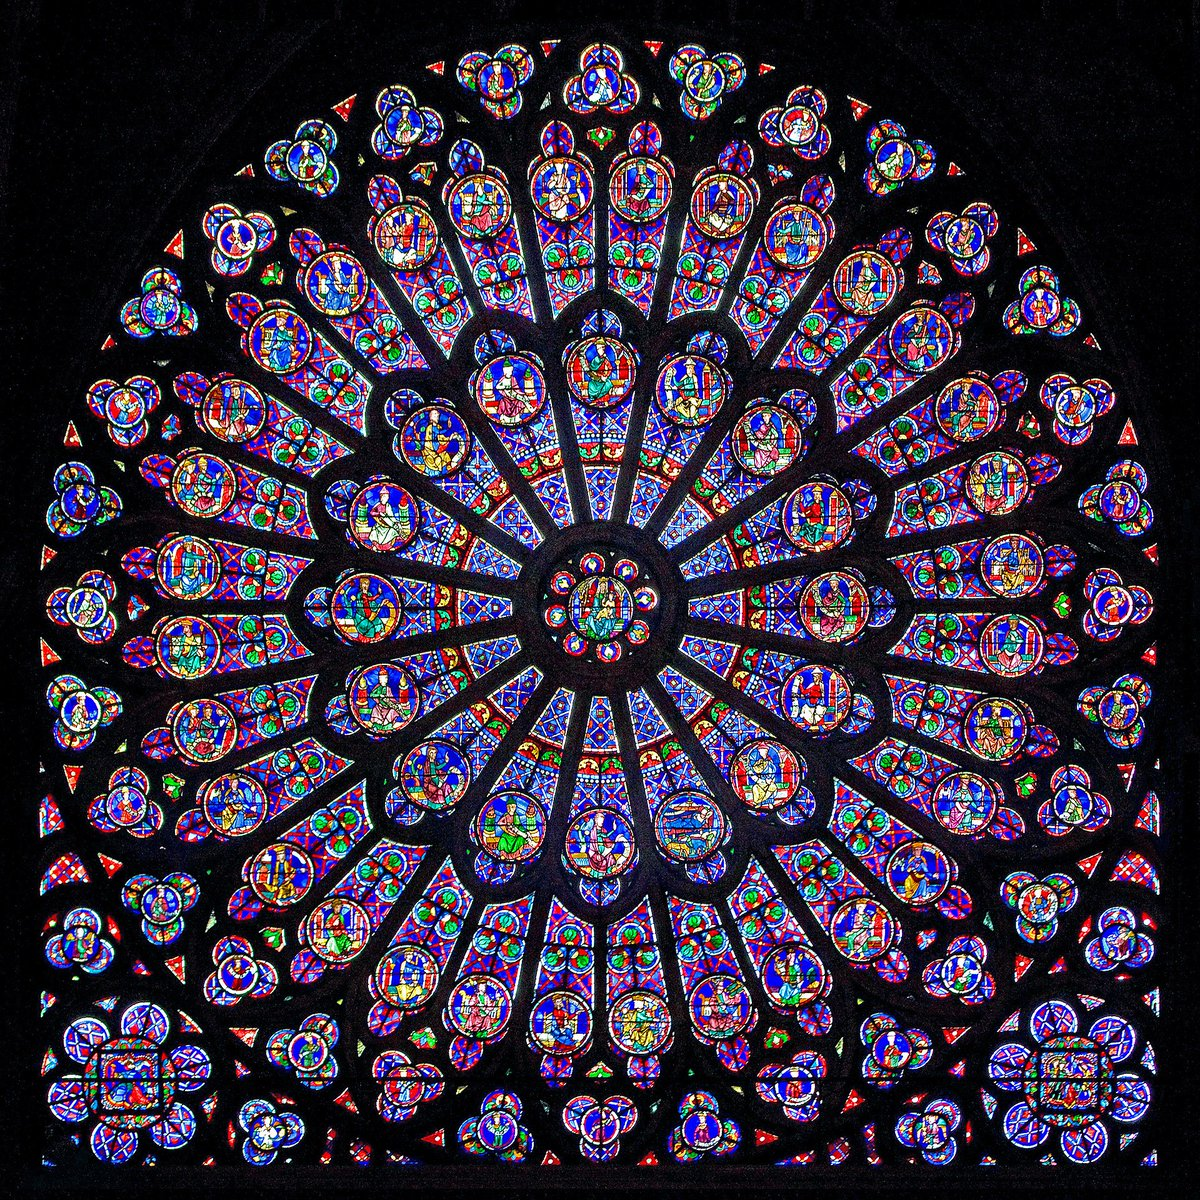 Notre-Dame de Paris, the north rose window (created circa 1250 CE).